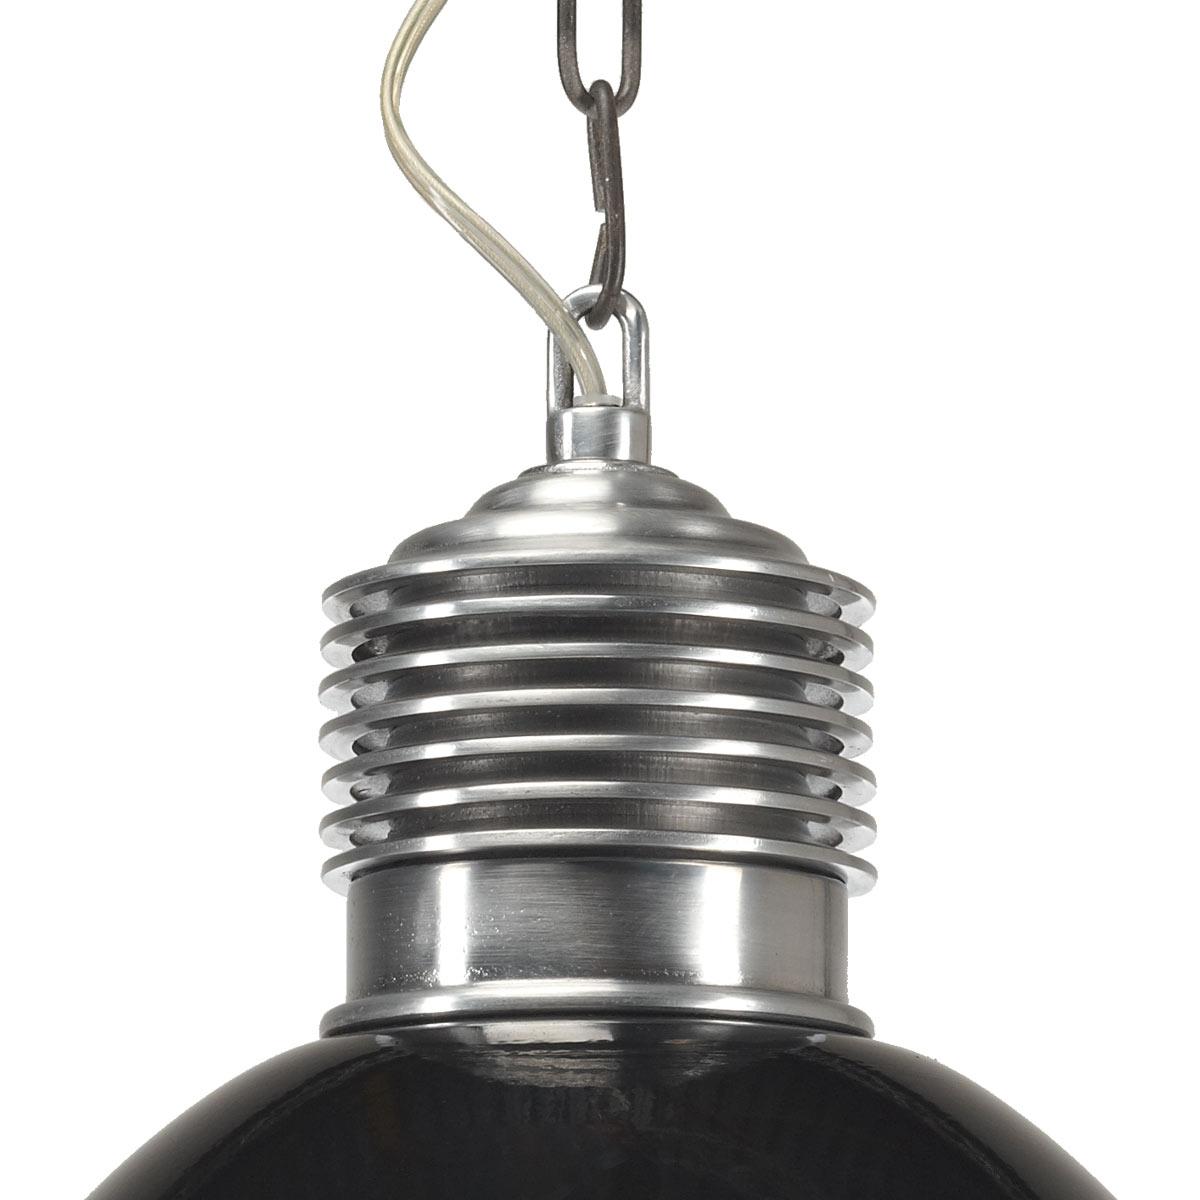 Hanglamp Loft Retro & Vintage Industrie Zwart